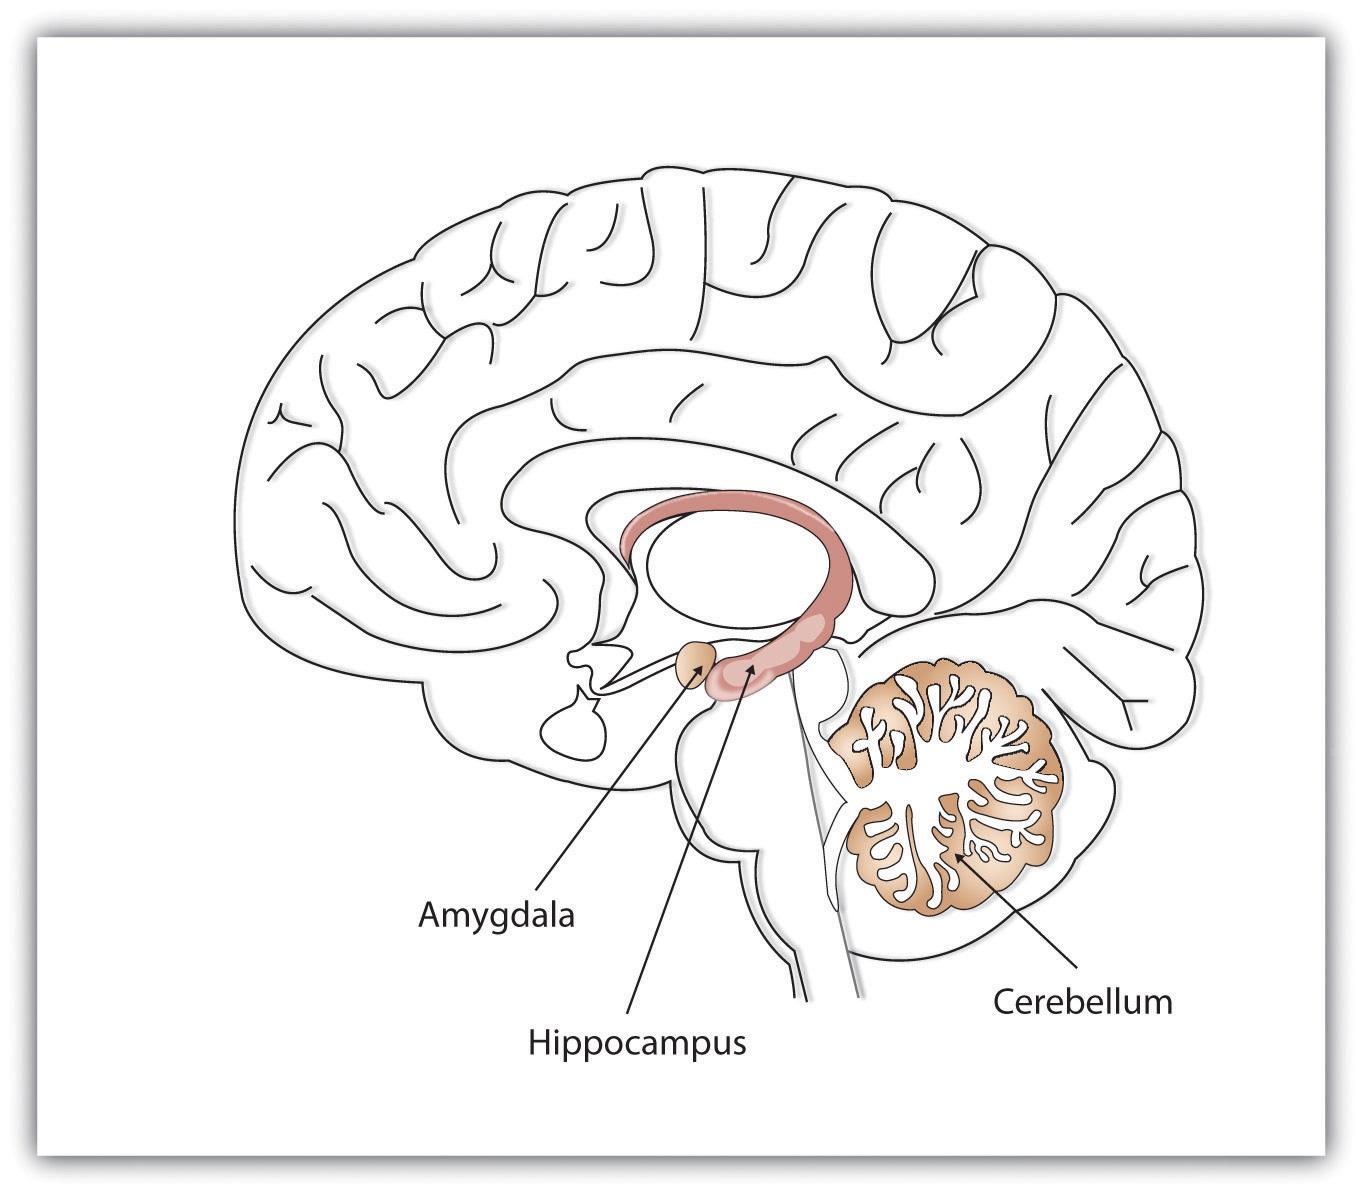 the role of amygdala in williams Amygdala: what does it do jacinta robenstine the role of the amygdala j neuropsychology 9(3): 382-394 stimuli in williams syndrome j.